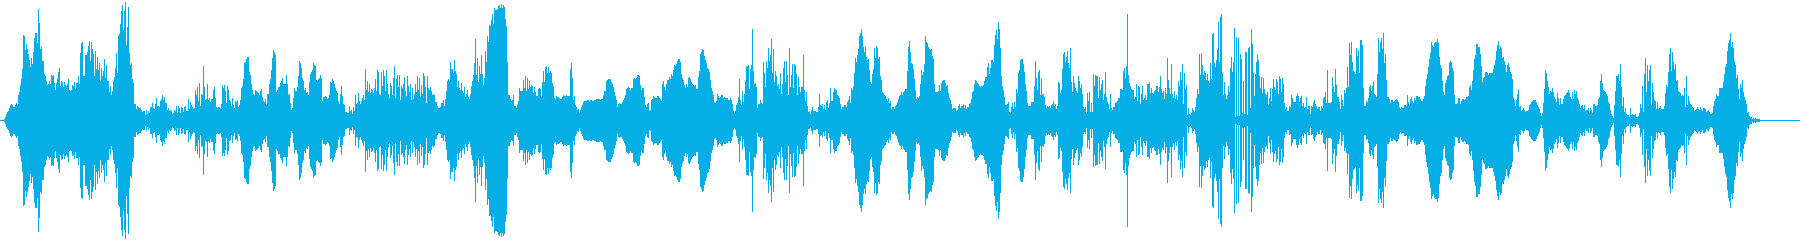 AGGRAVATED VOCALク...の再生済みの波形